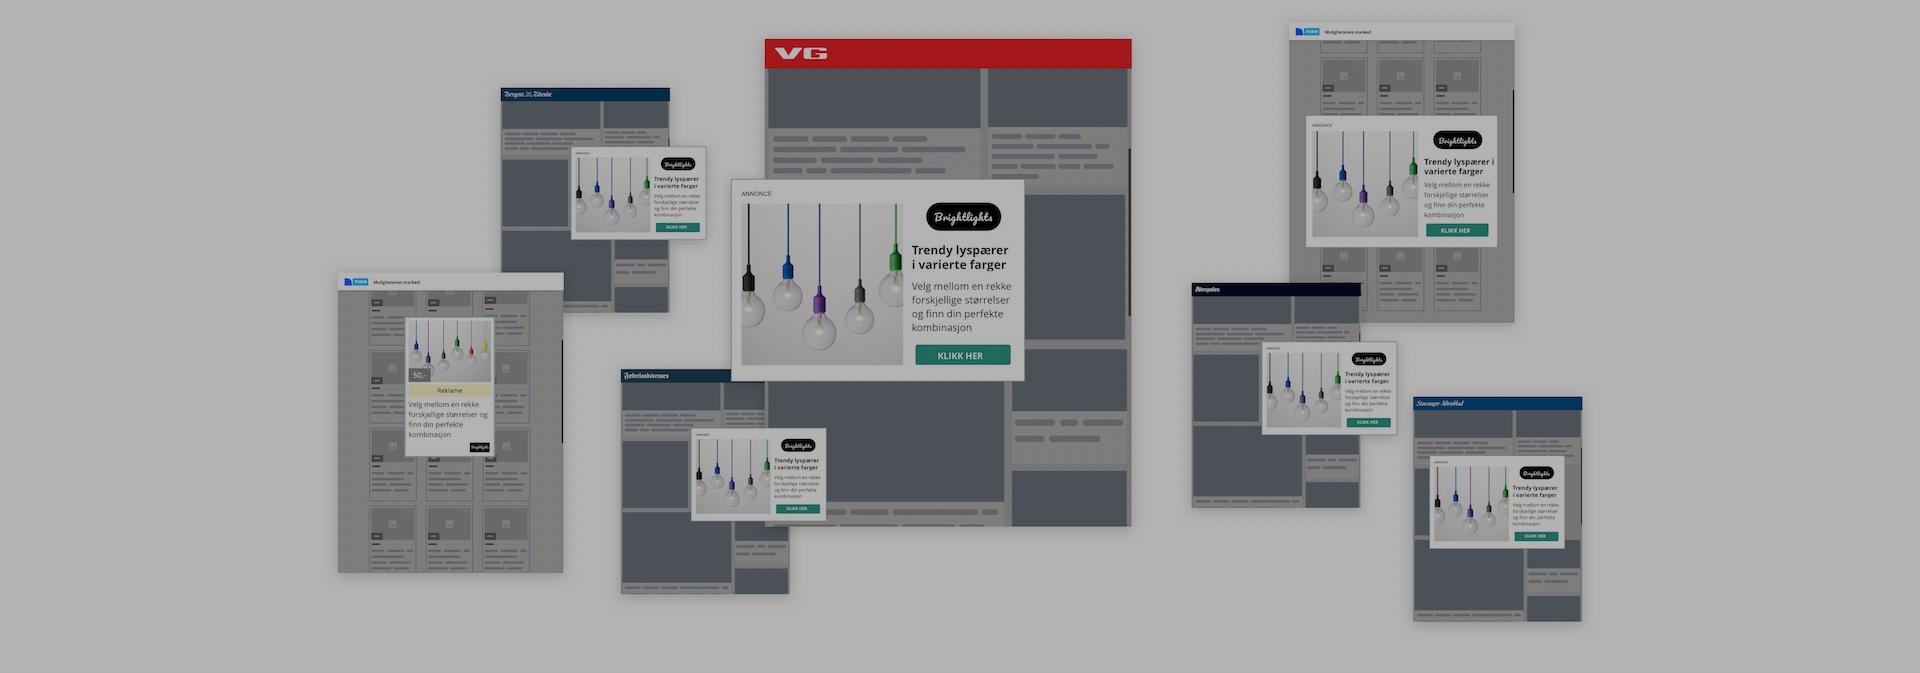 User interface design -